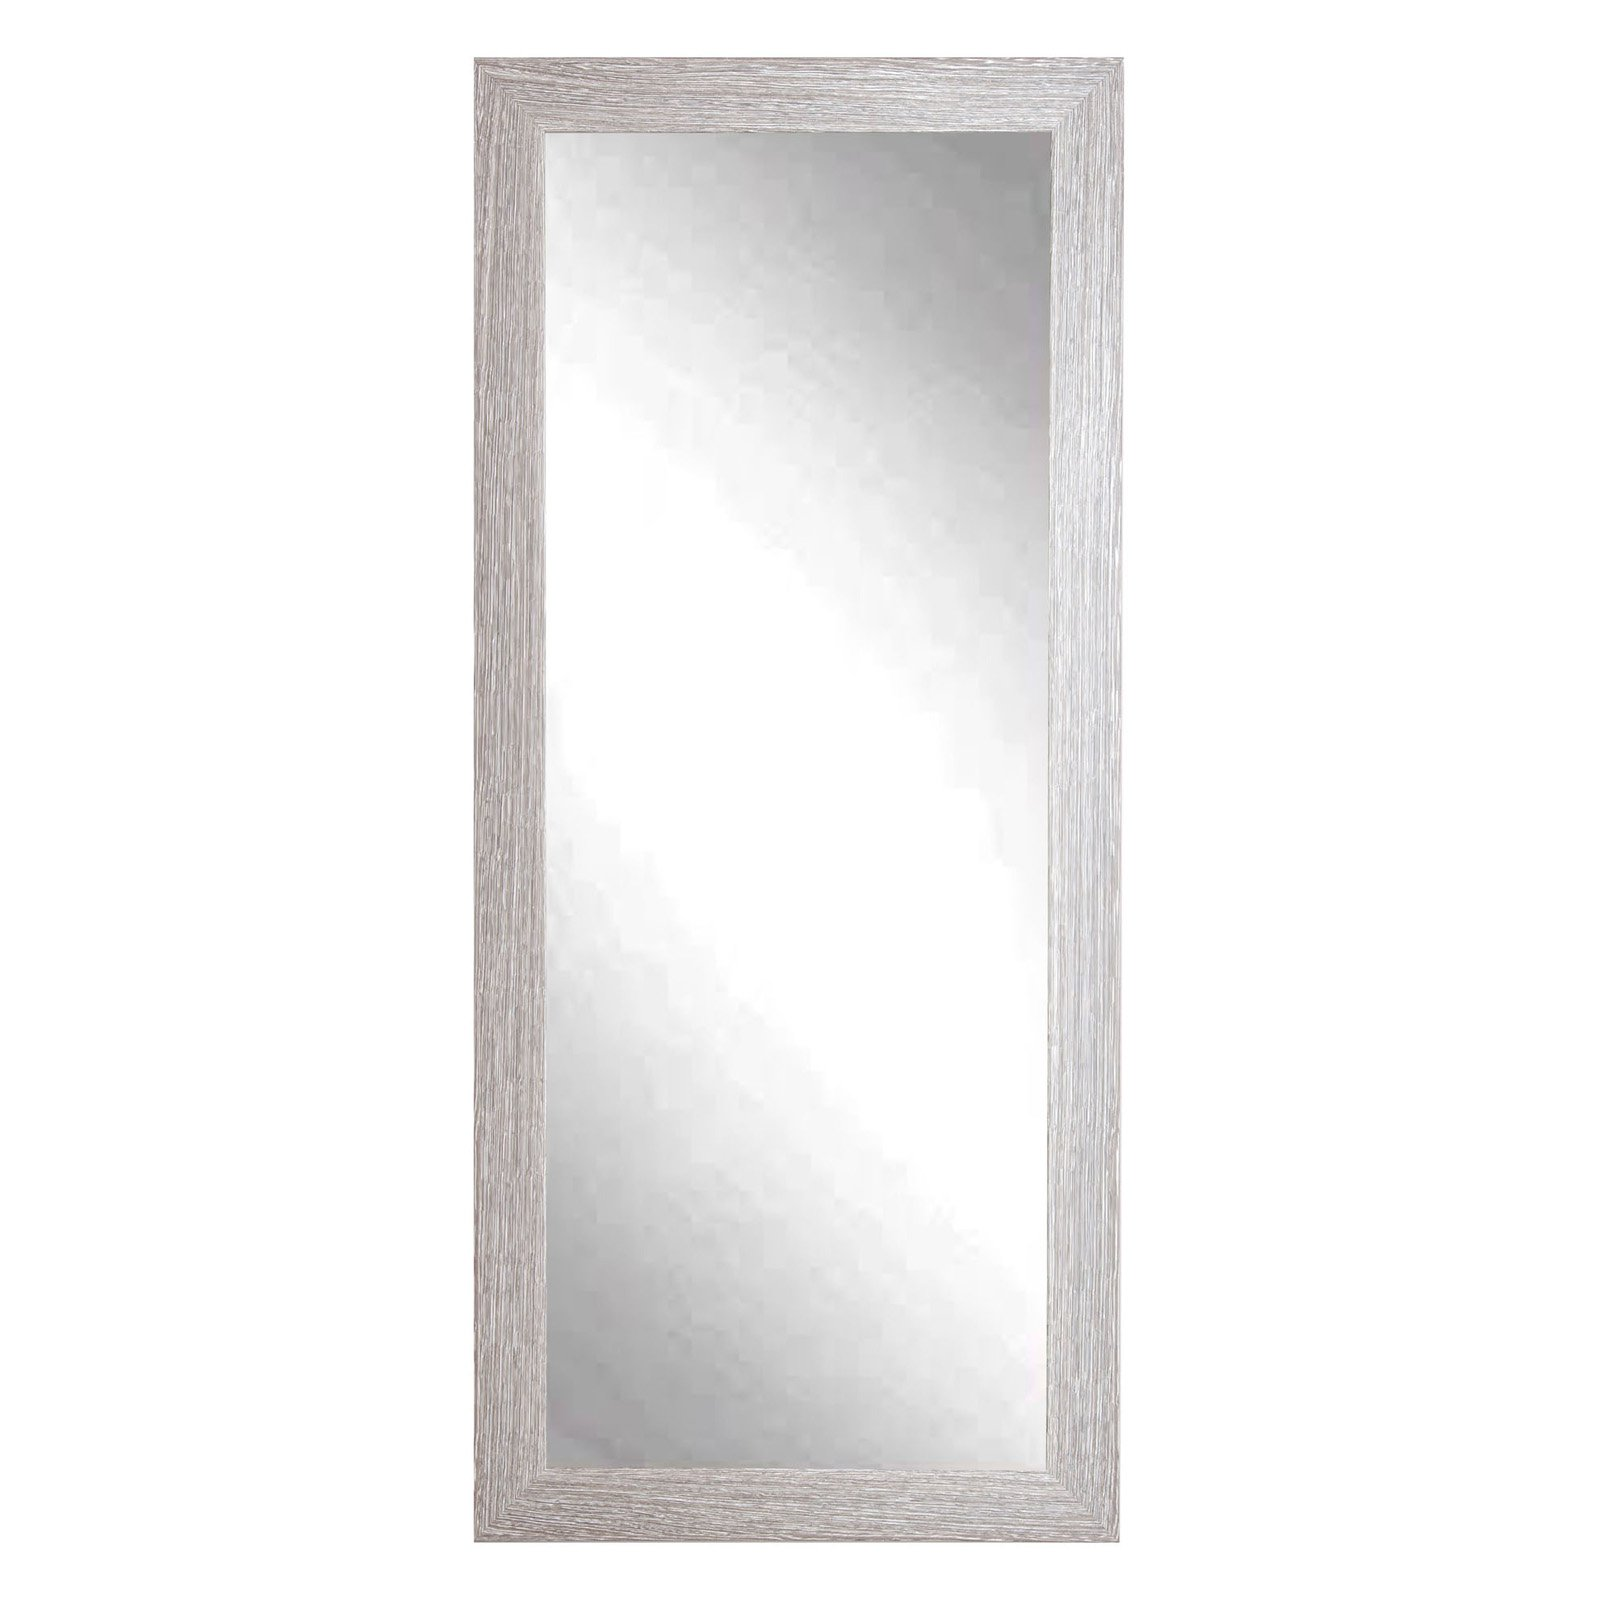 BrandtWorks Farmhouse Barnwood Leaning Floor Mirror by